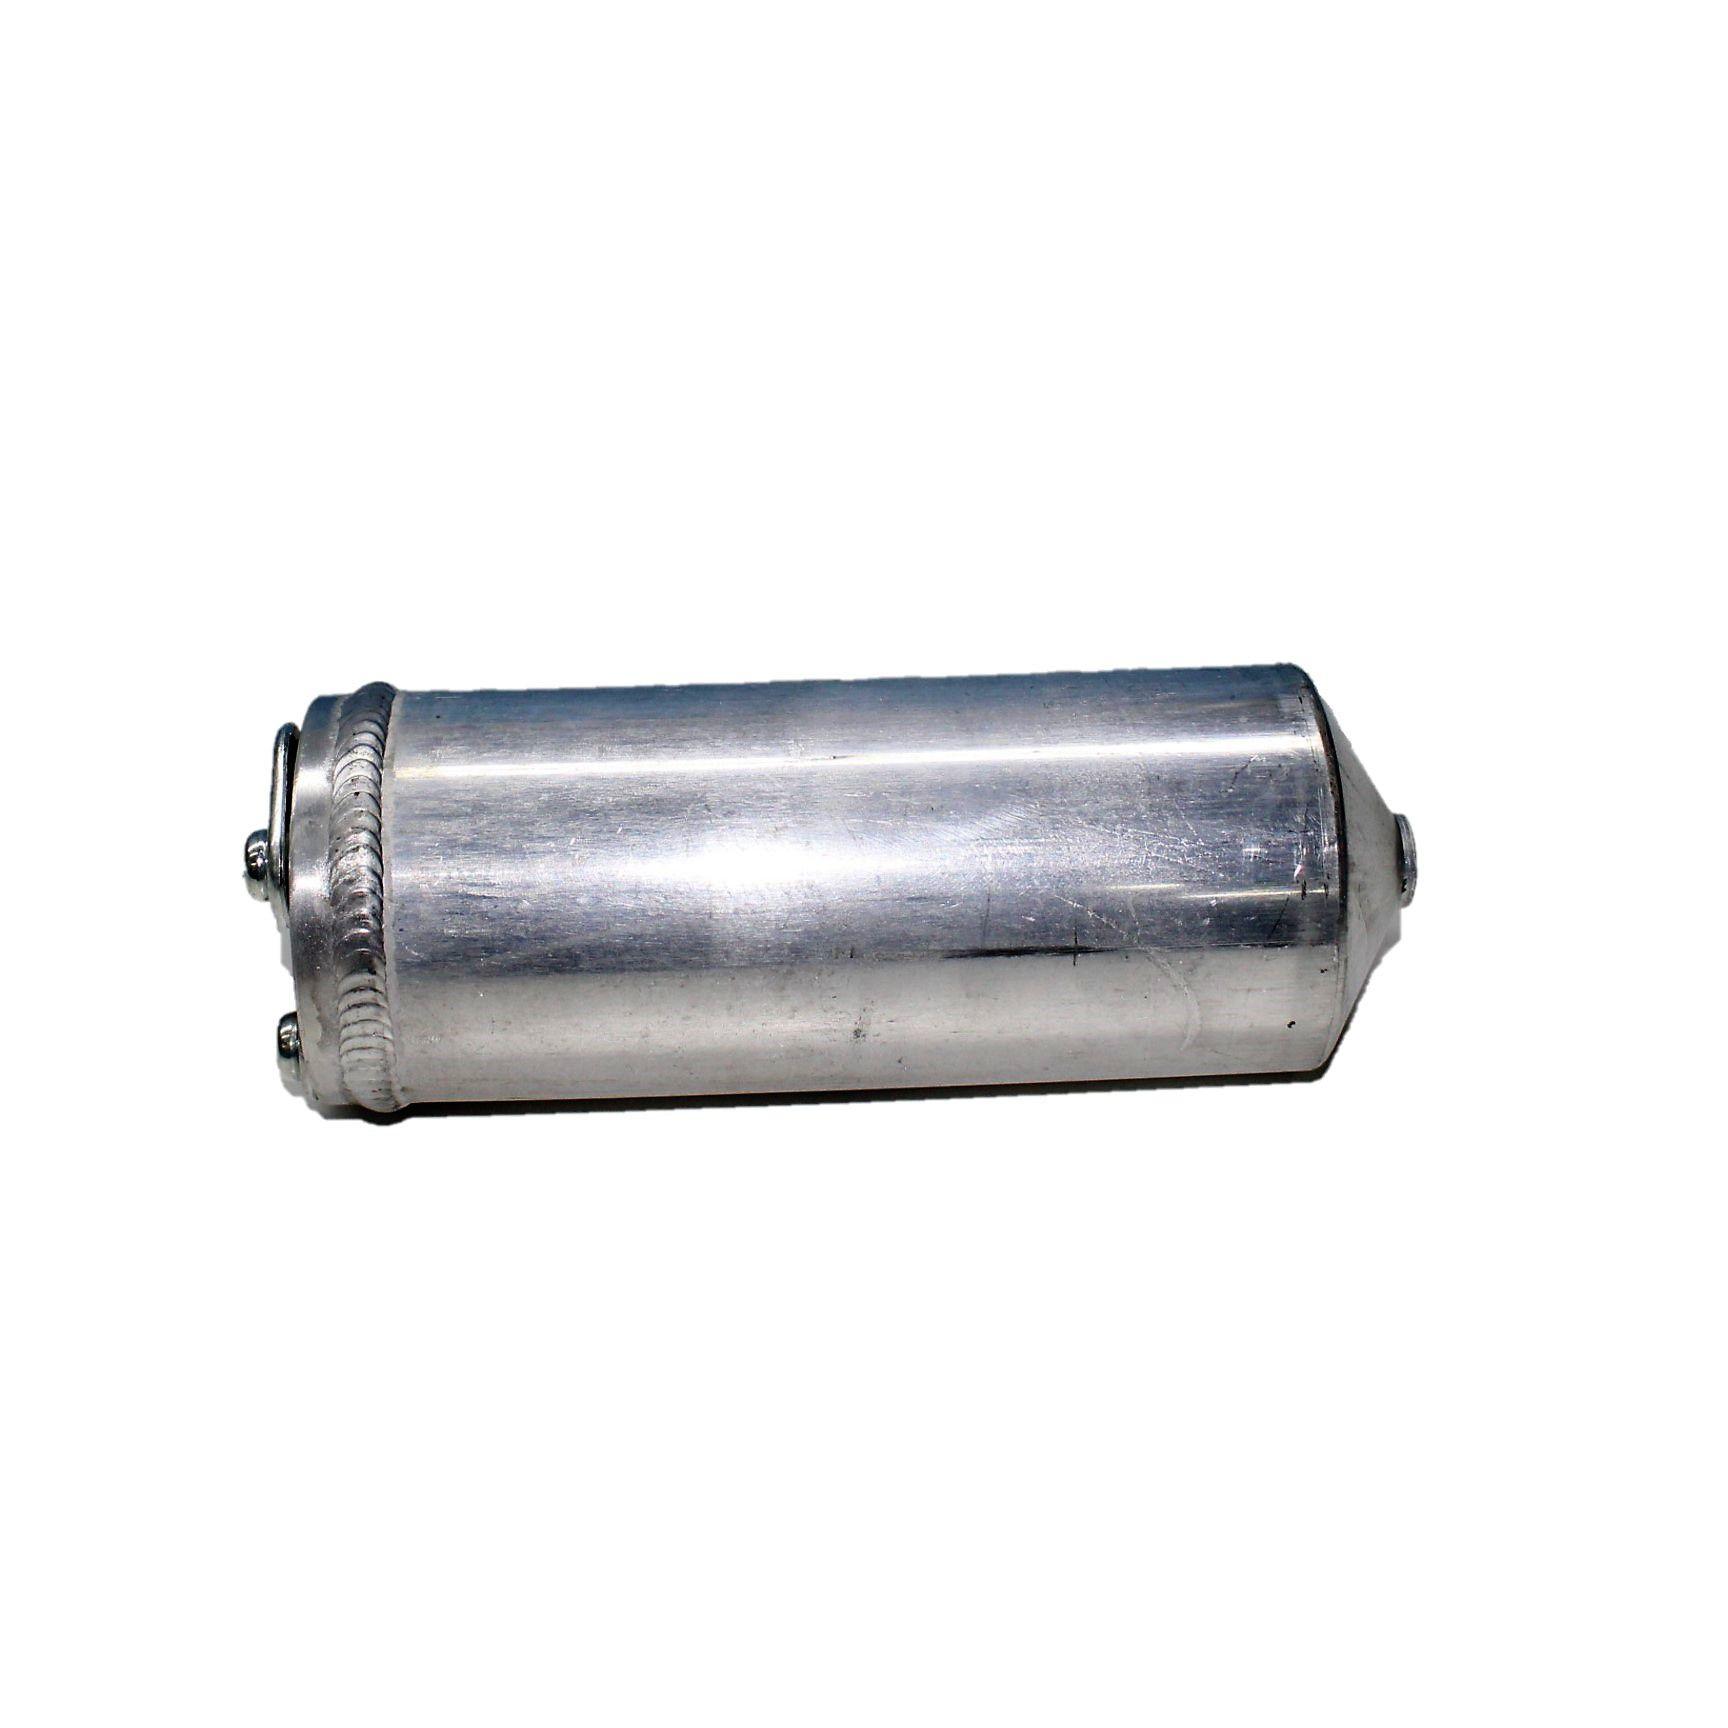 Filtro Secador Ar Condicionado Corsa 99...00 c/ Compressor Zexel